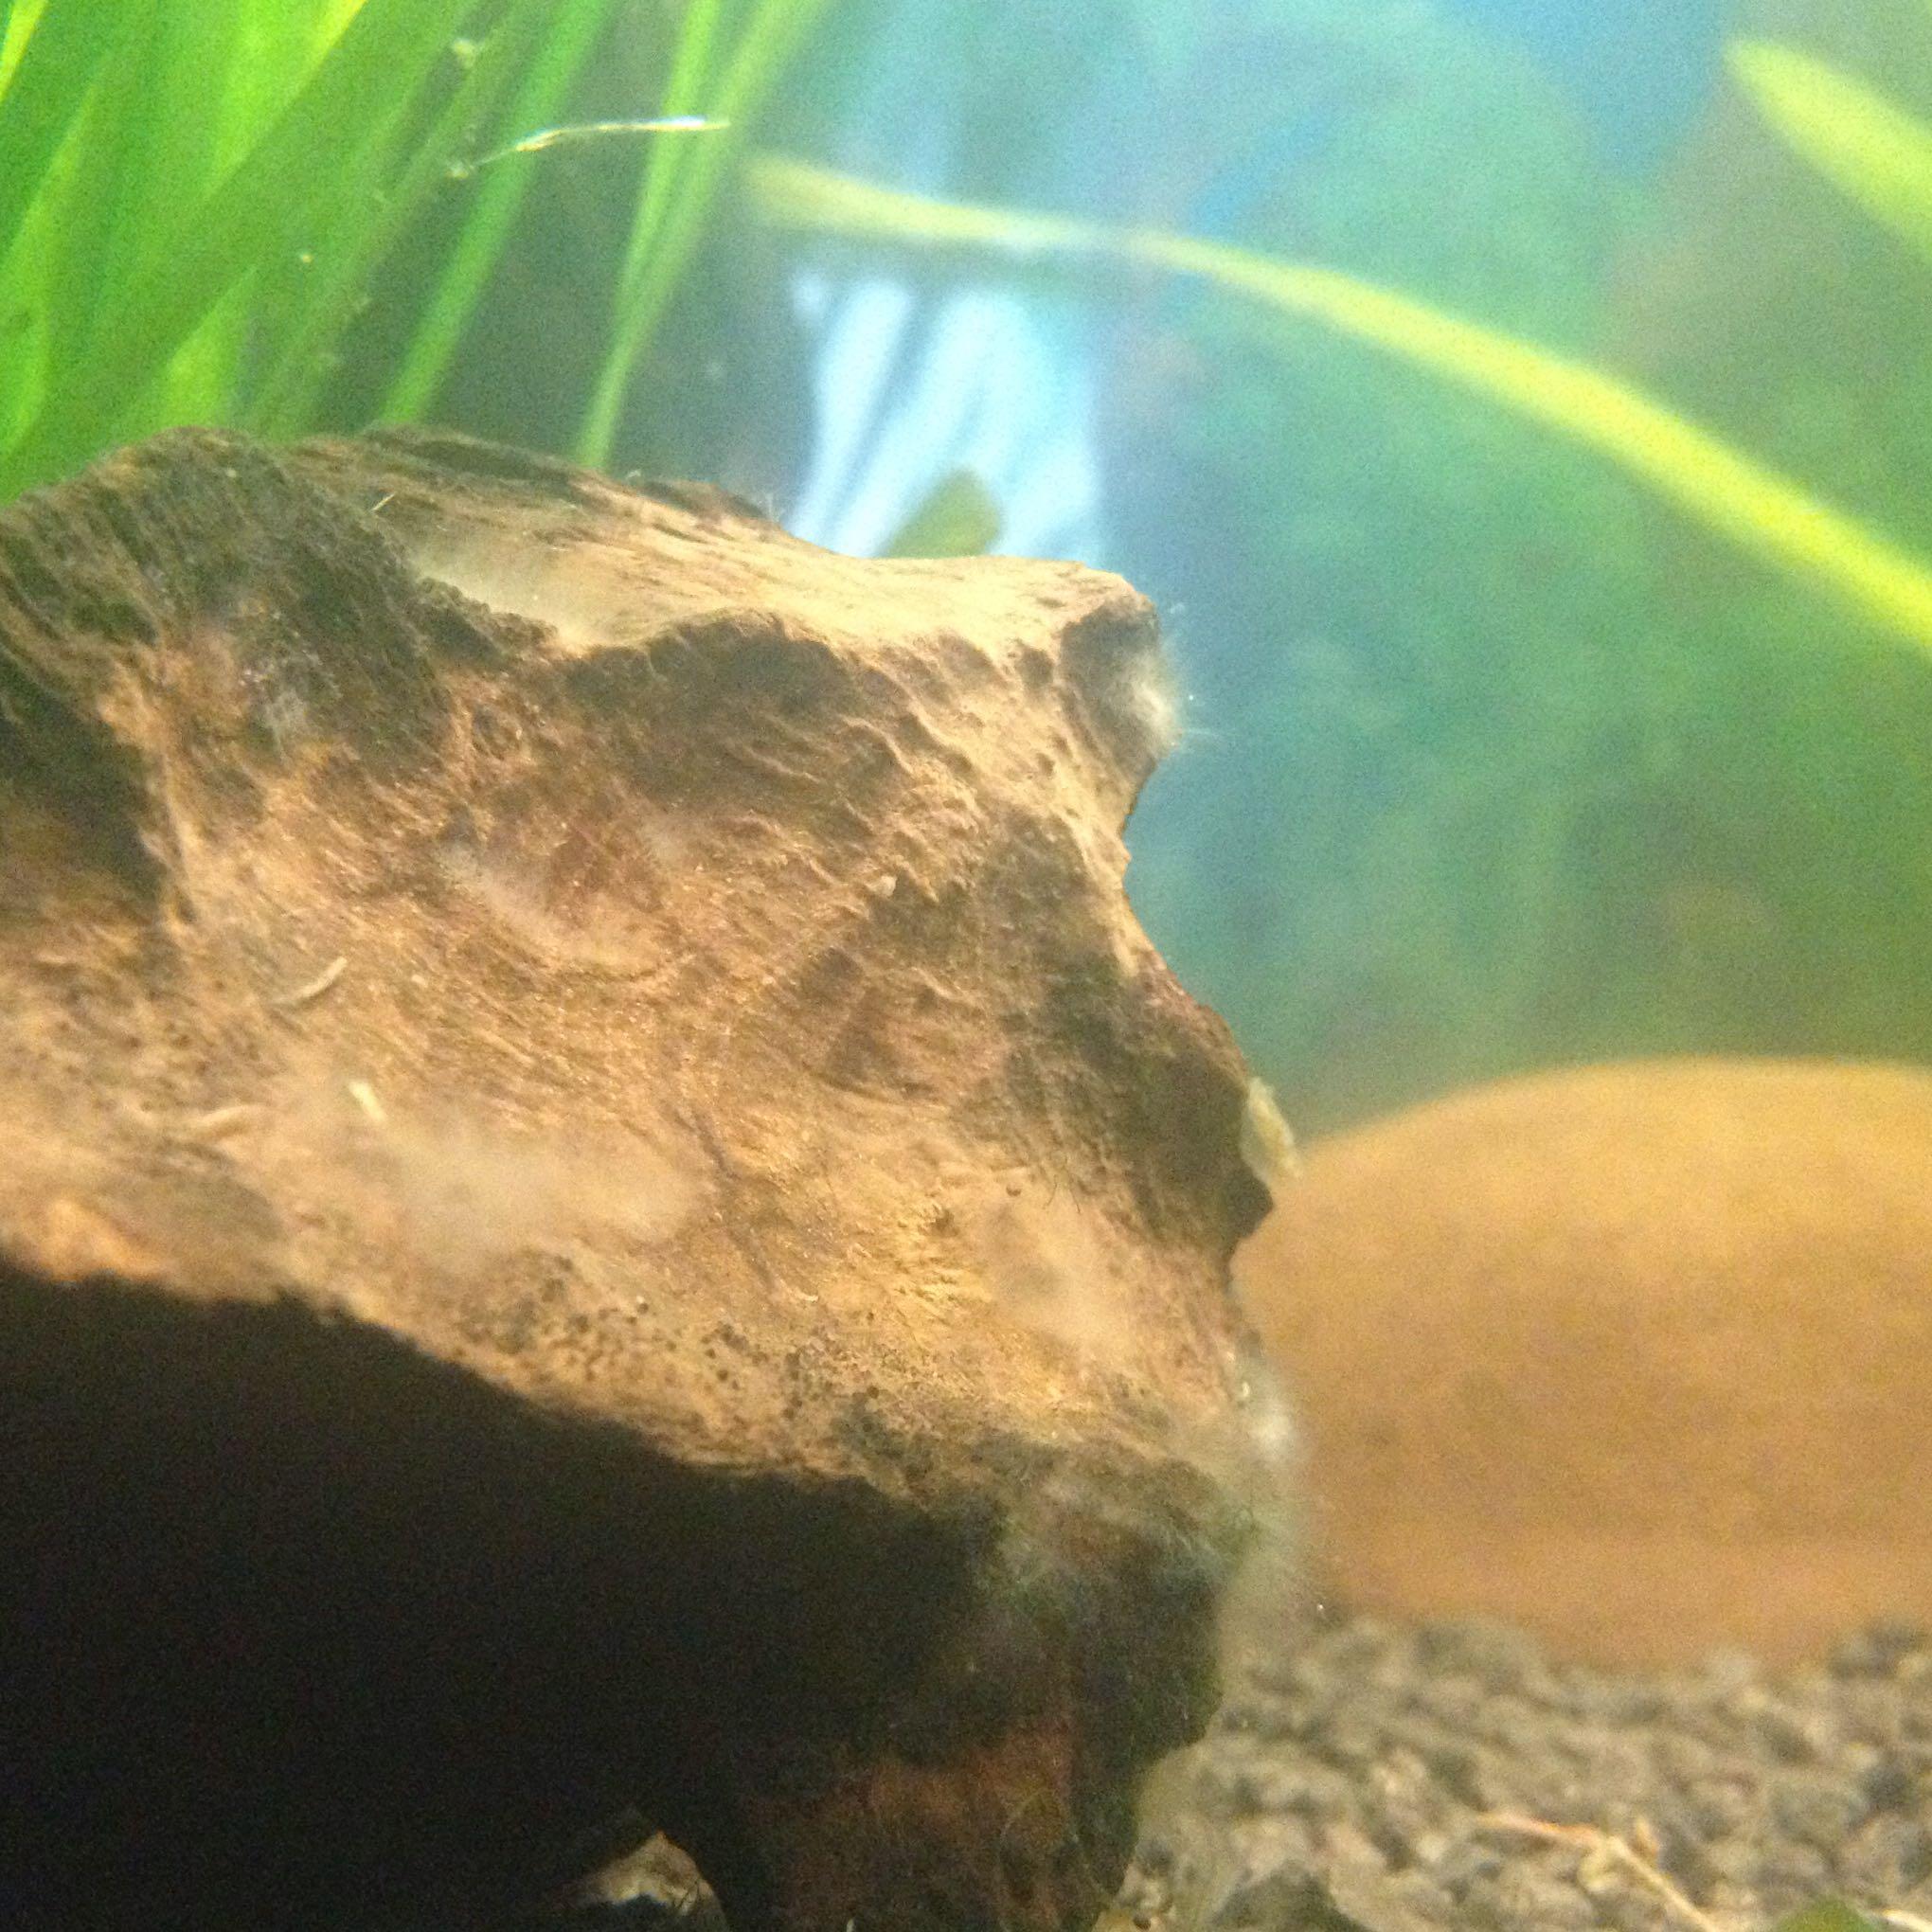 algen oder schimmel fische aquarium aquaristik. Black Bedroom Furniture Sets. Home Design Ideas